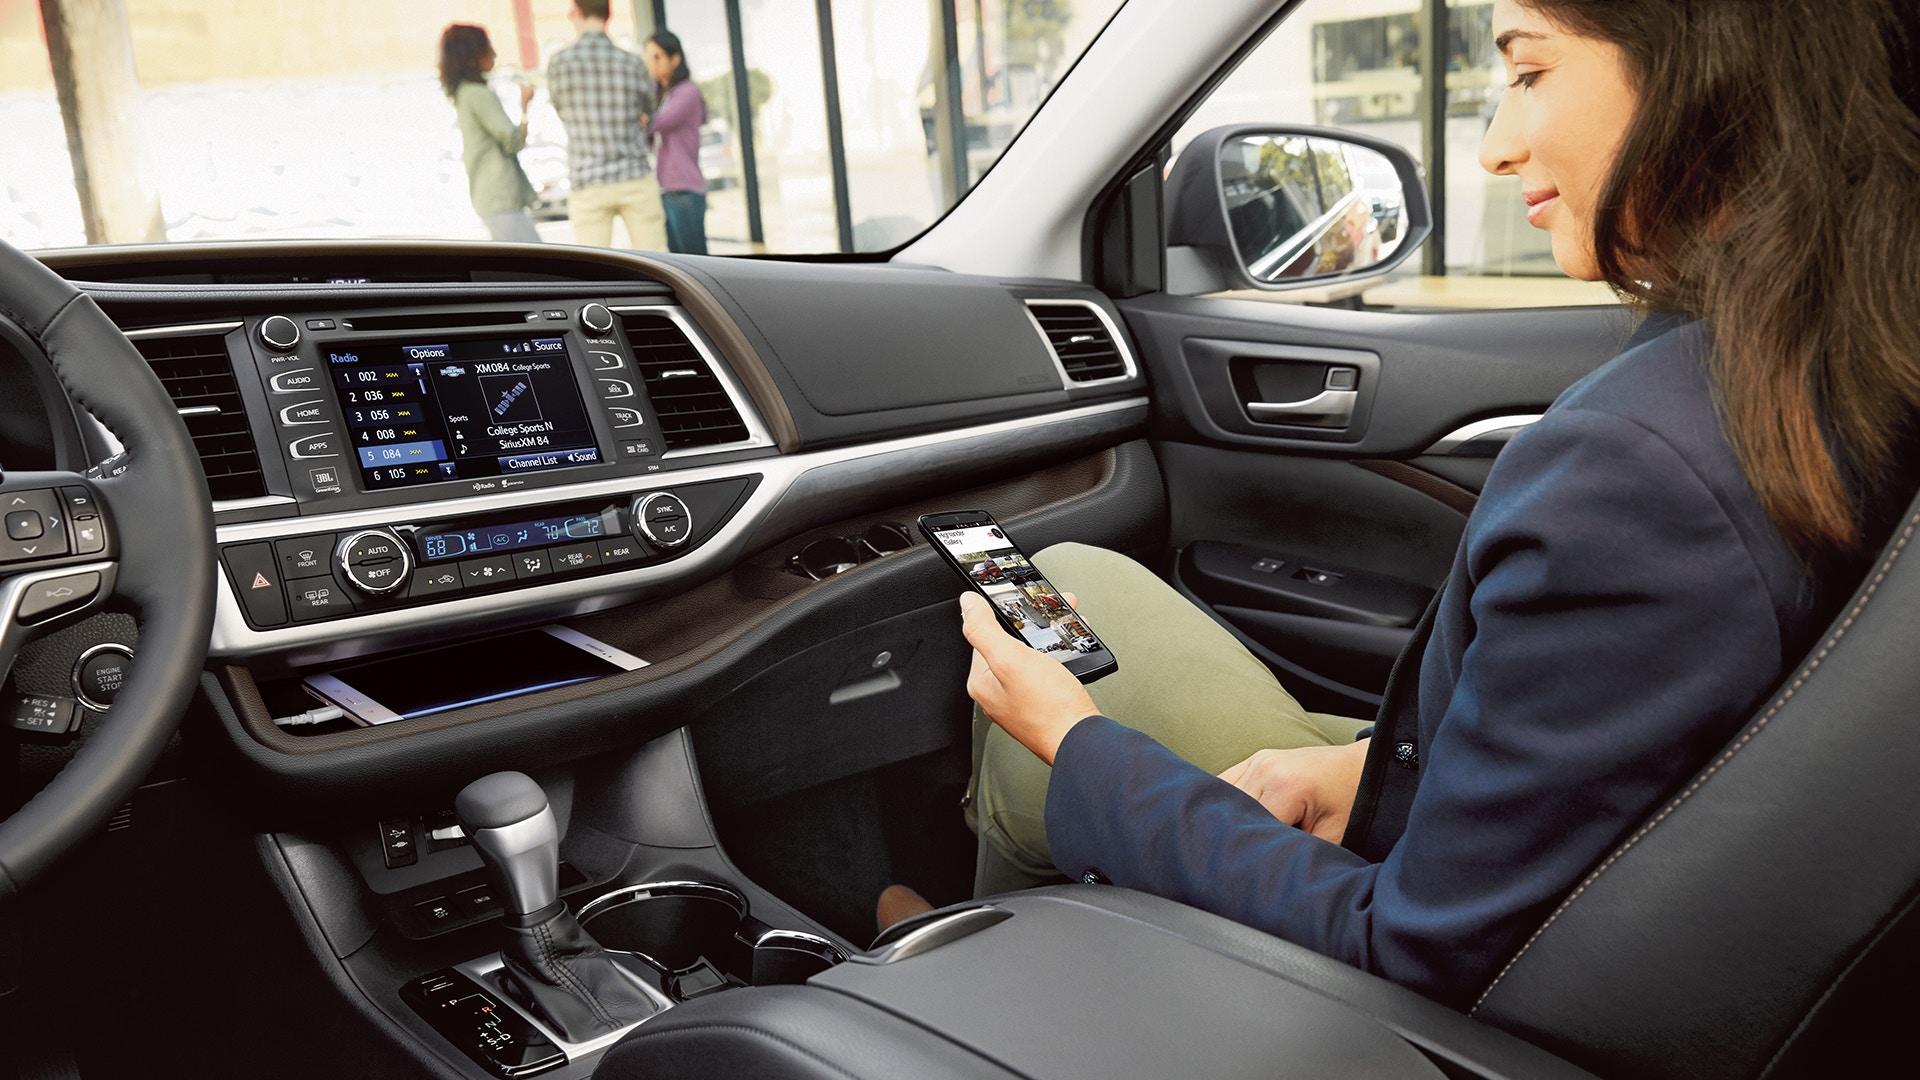 2019 Toyota Highlander's Tech Amenities